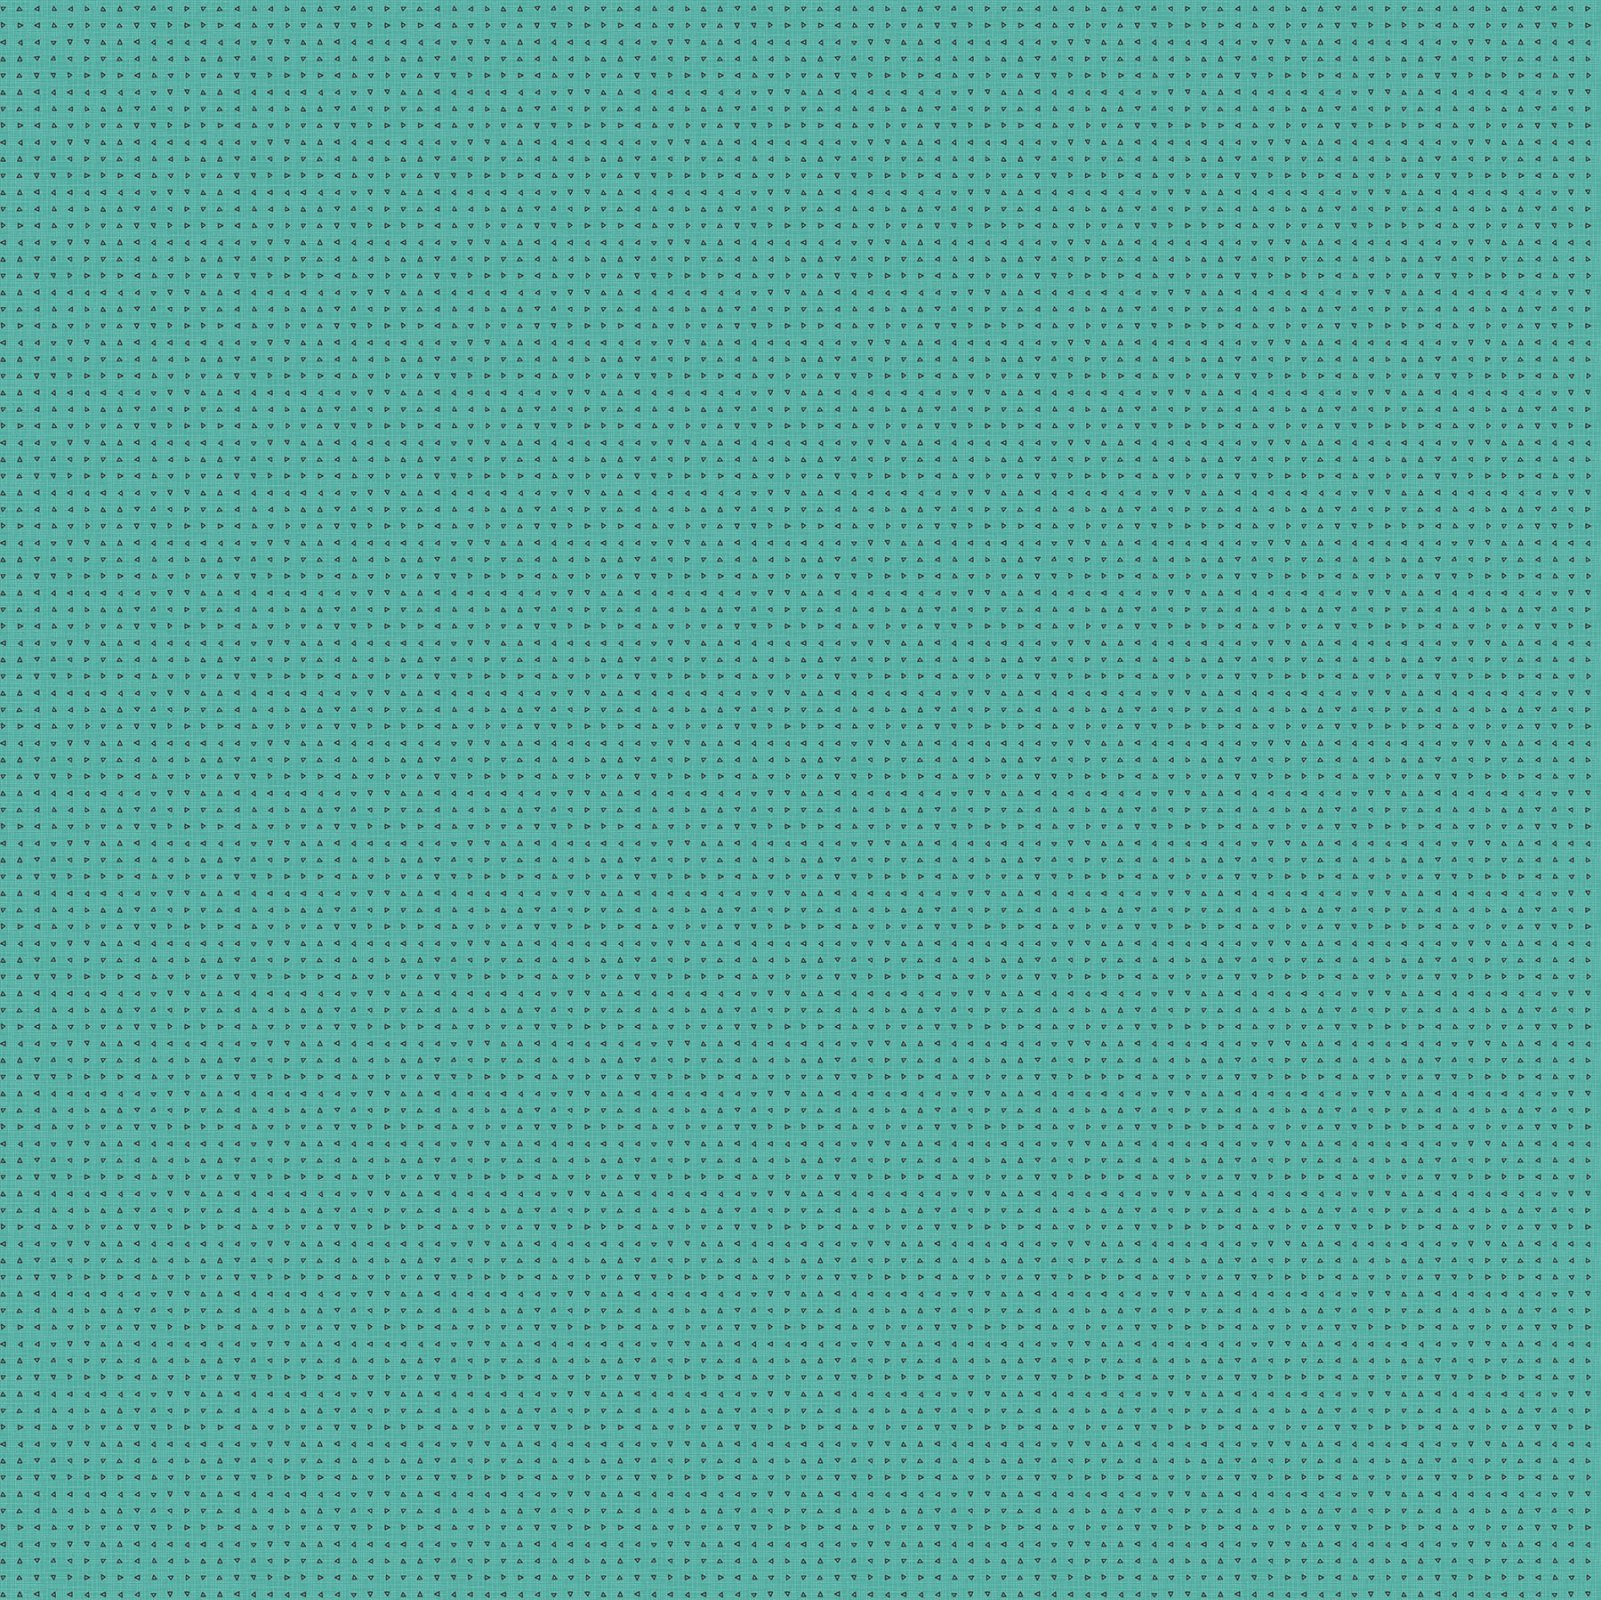 Cosmo Oxygen - Triangle Blend Aqua